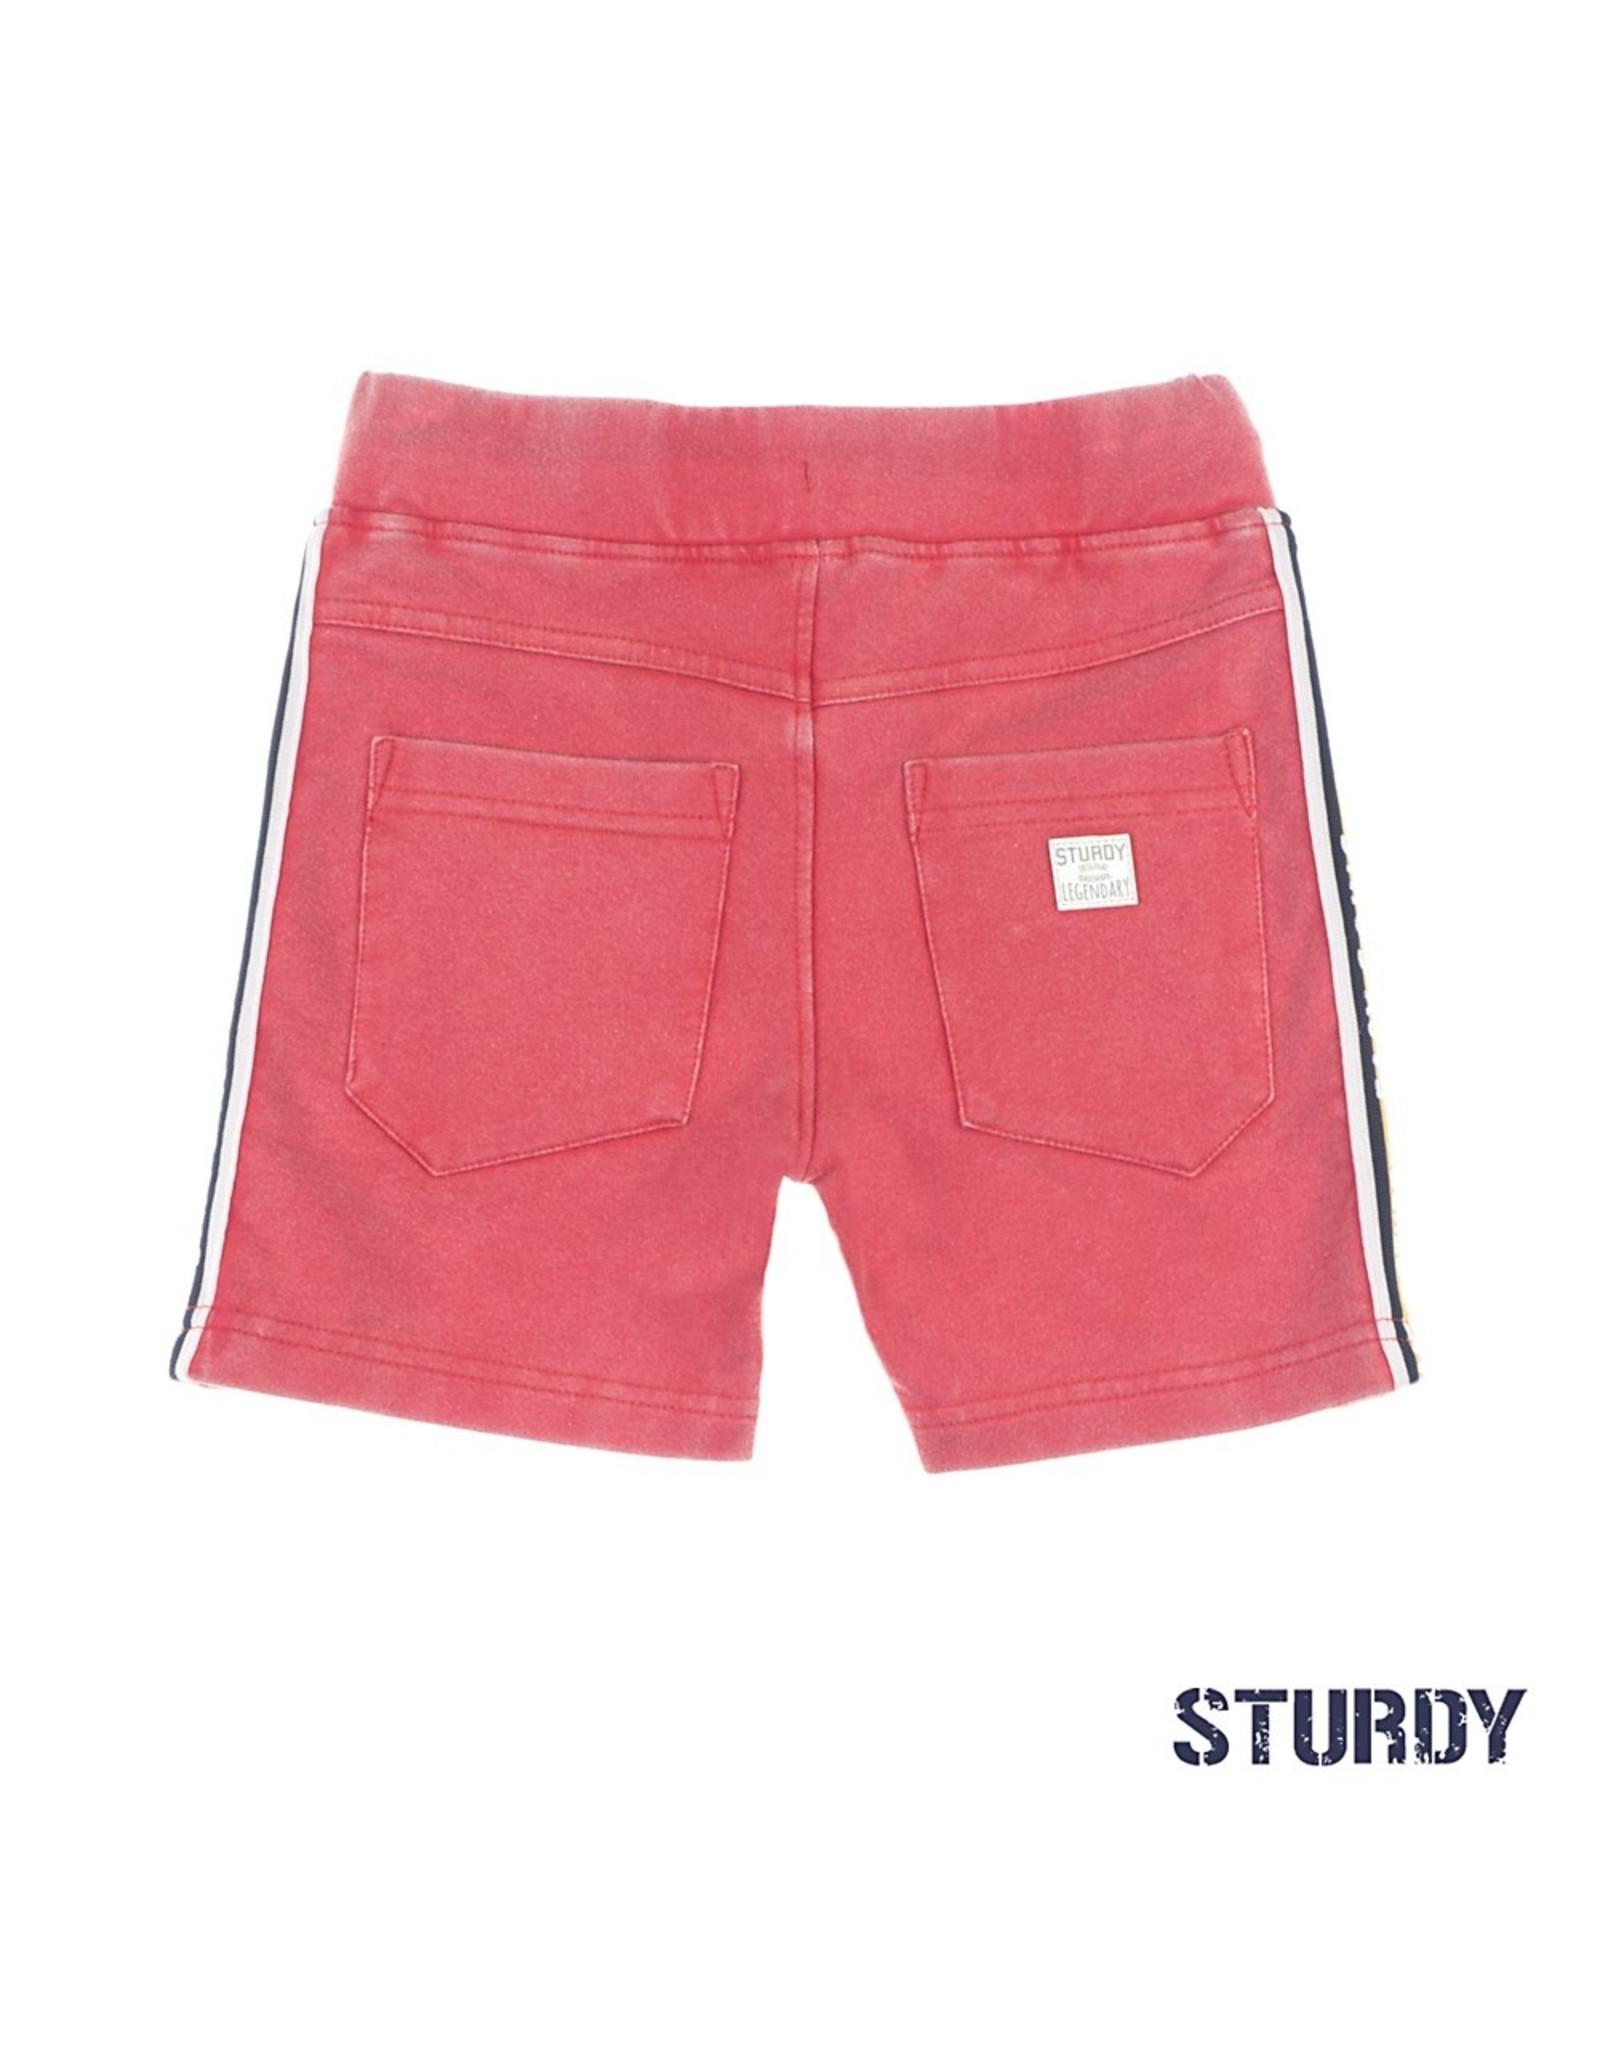 Sturdy Short - Thrillseeker rood